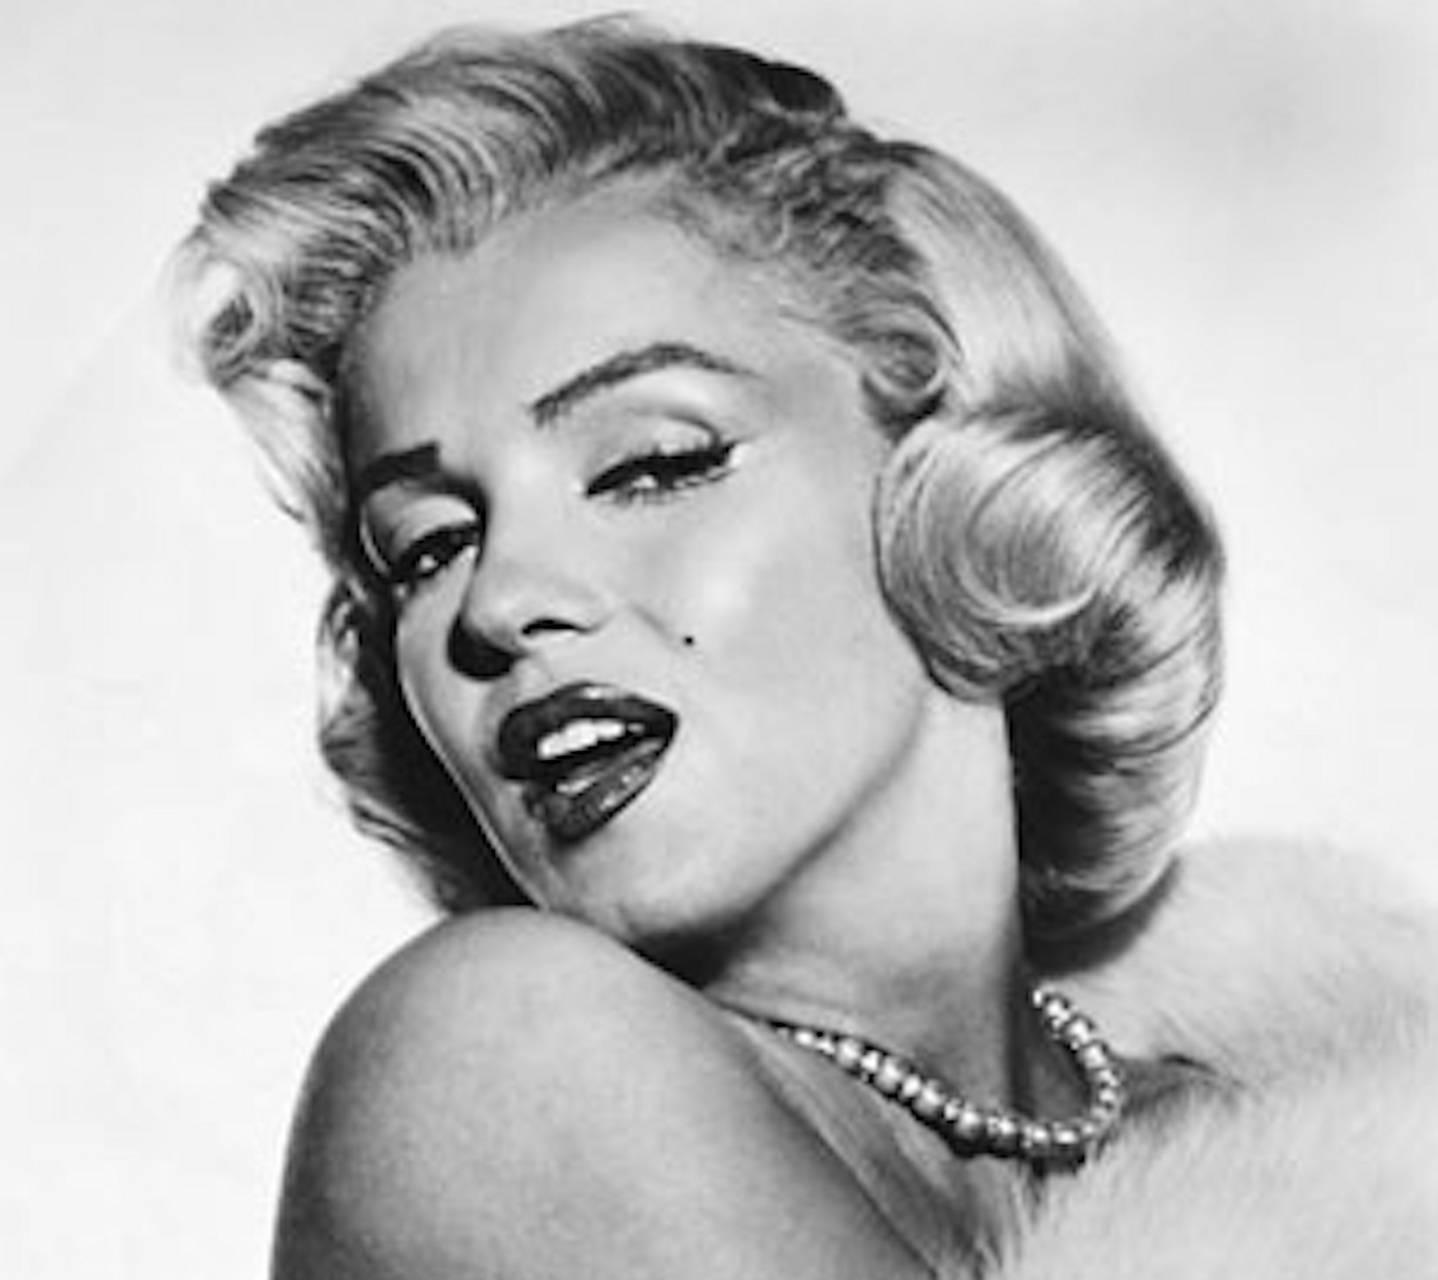 Marilyn Monroe Wallpaper By Marimar94 49 Free On Zedge